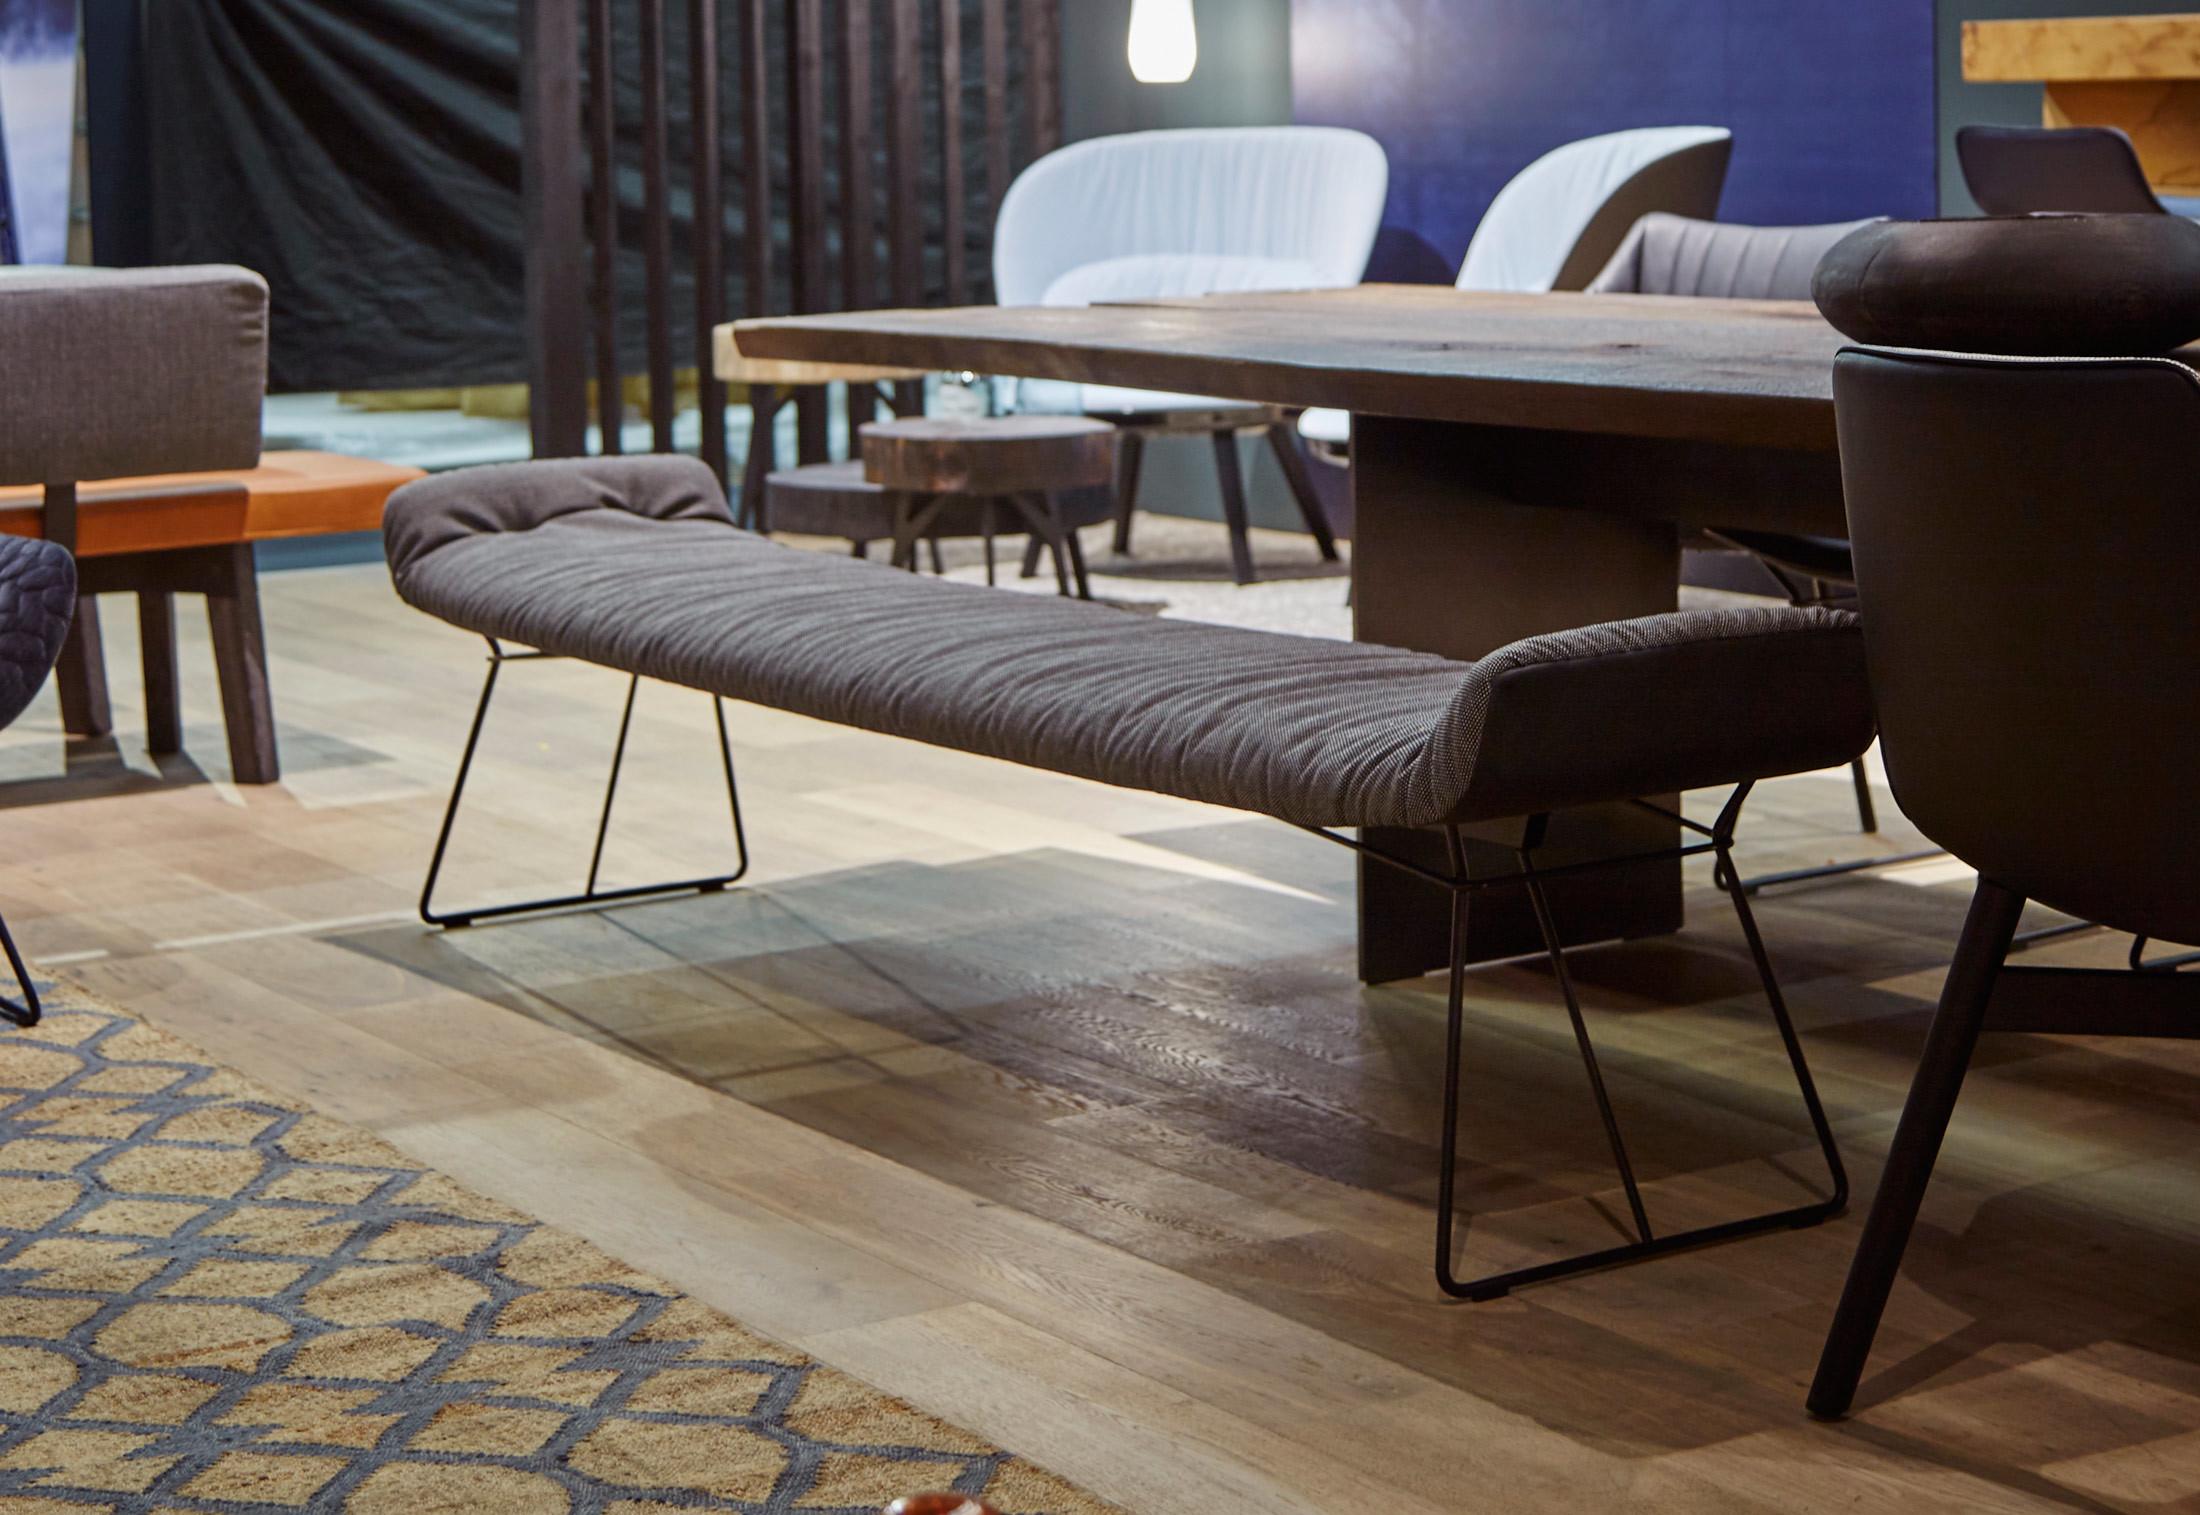 Leya Bench Without Backrest By Freifrau Stylepark